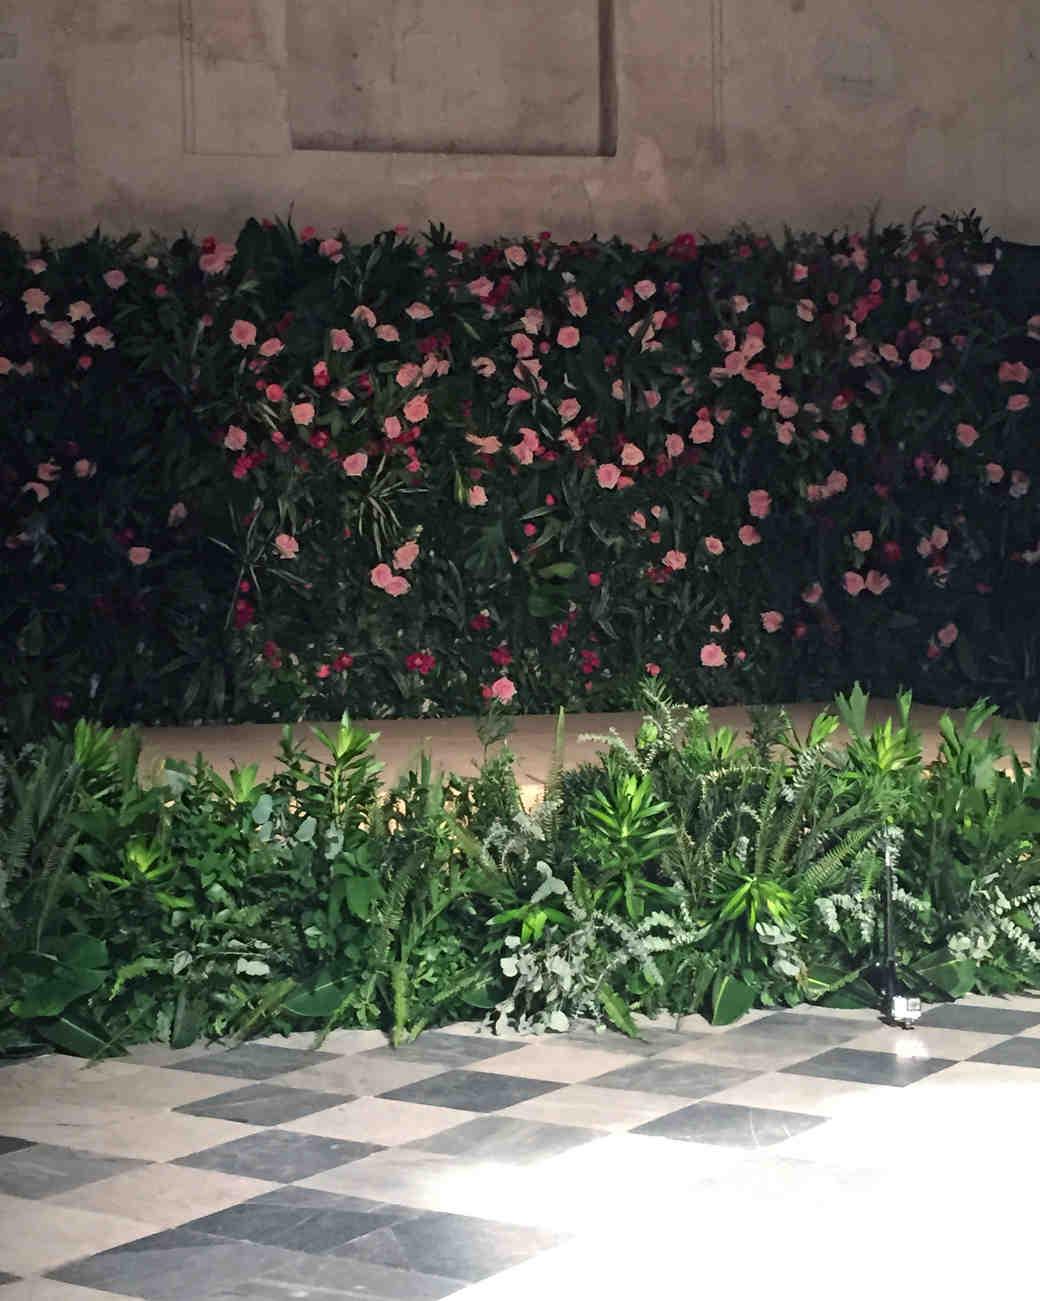 cartagena-bridal-week-matthew-robbins-7837-4-0915.jpg